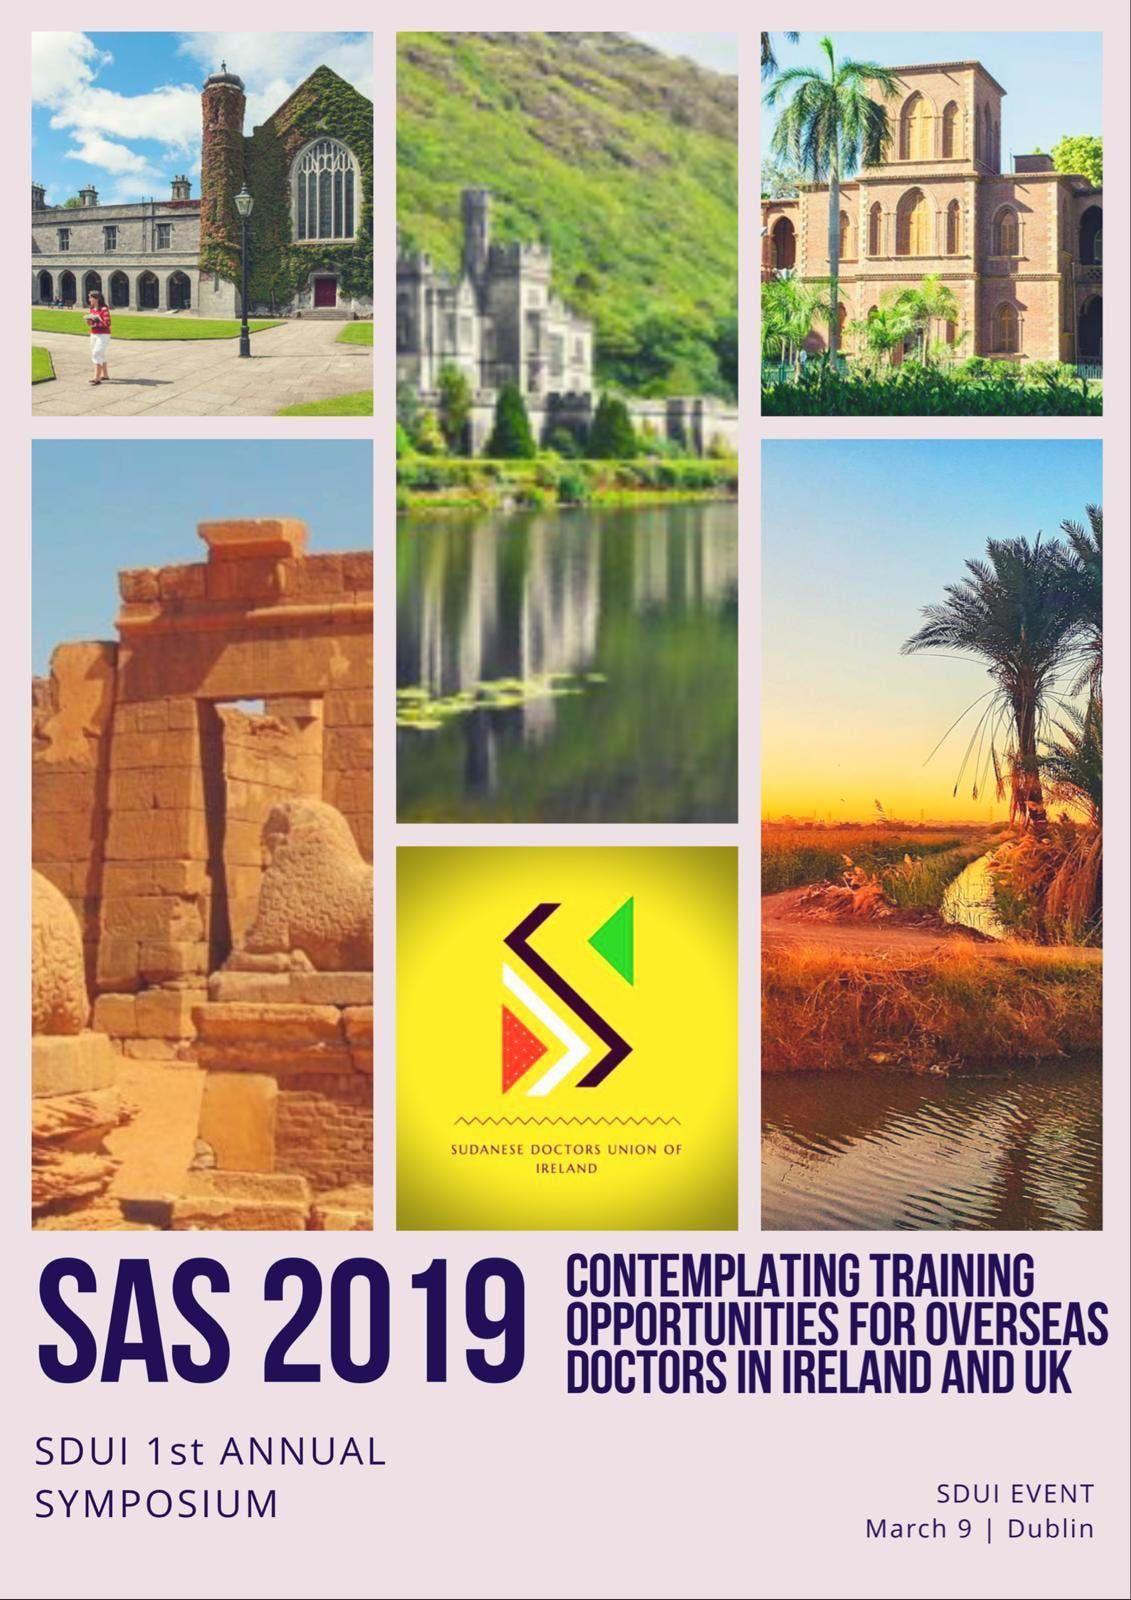 SDUI 1st Annual Symposium